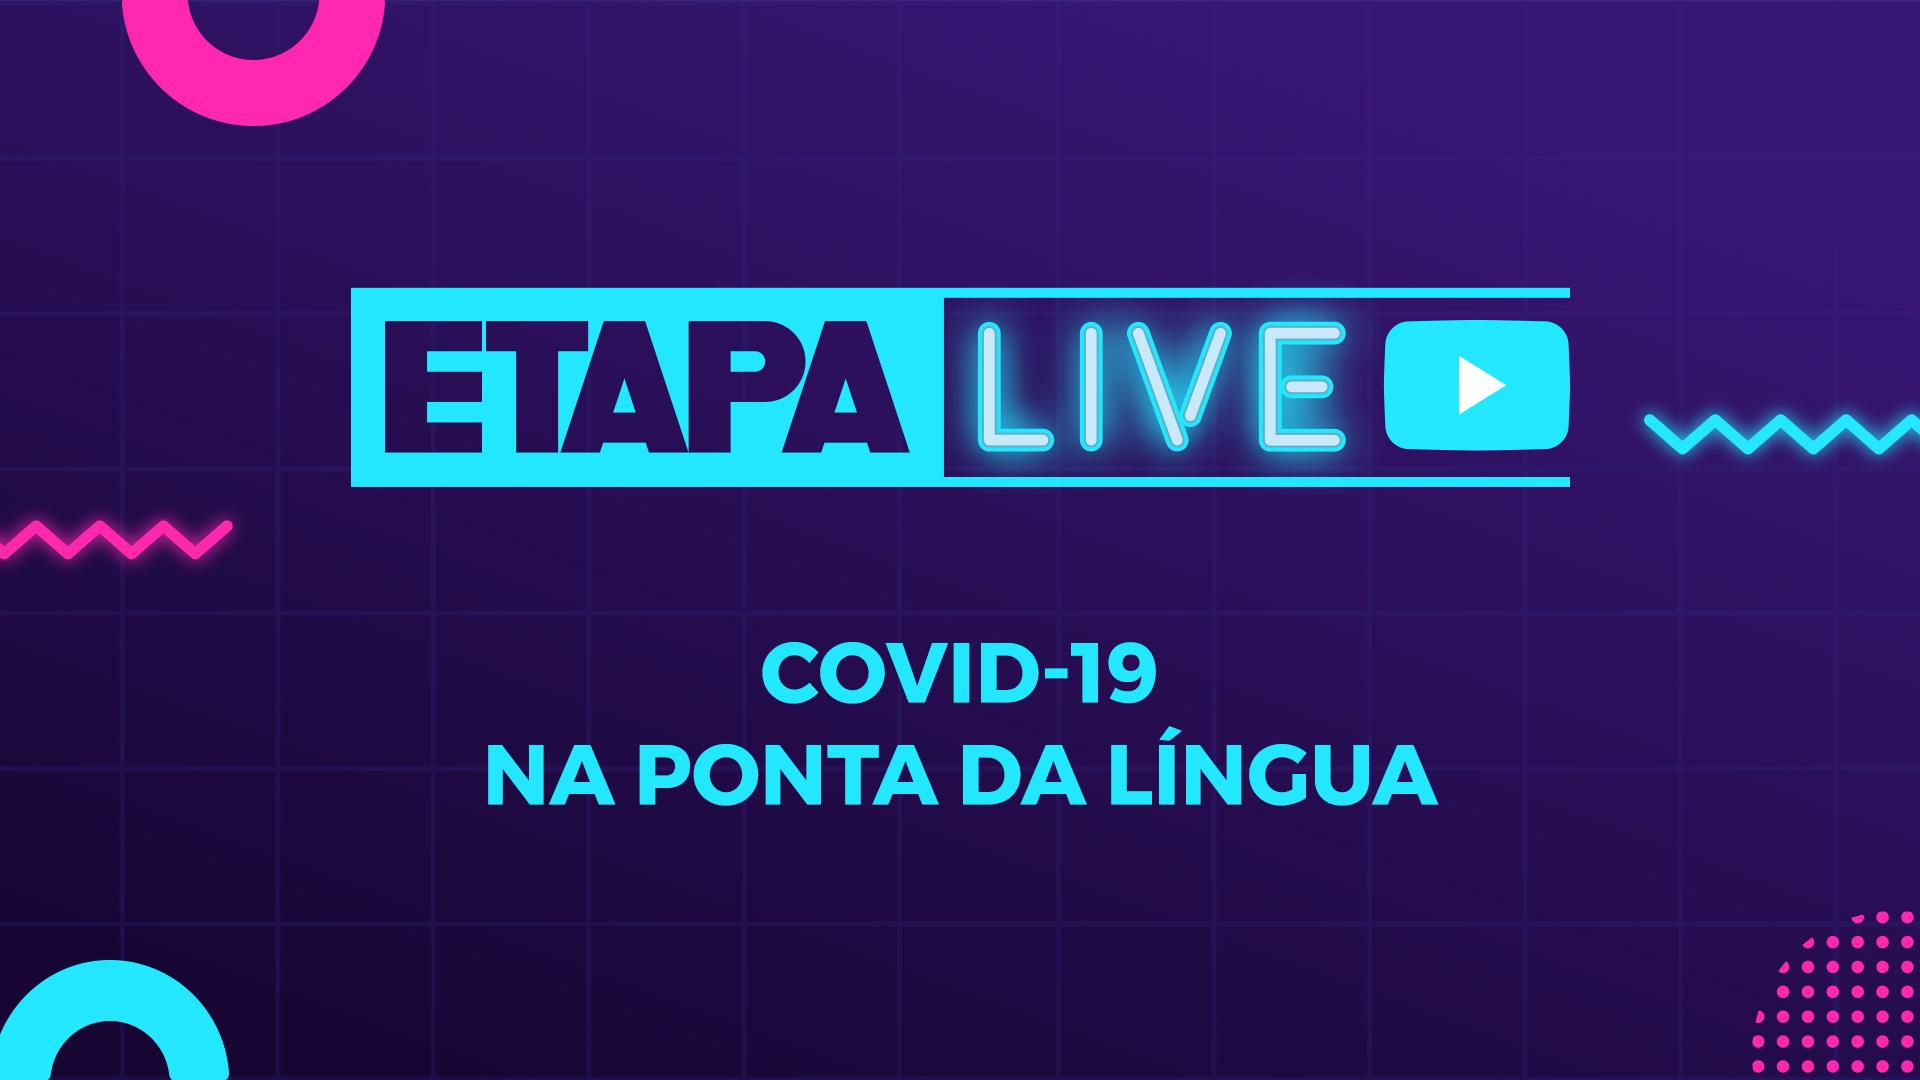 Covid-19 na ponta da língua: o que rolou na live do Etapa